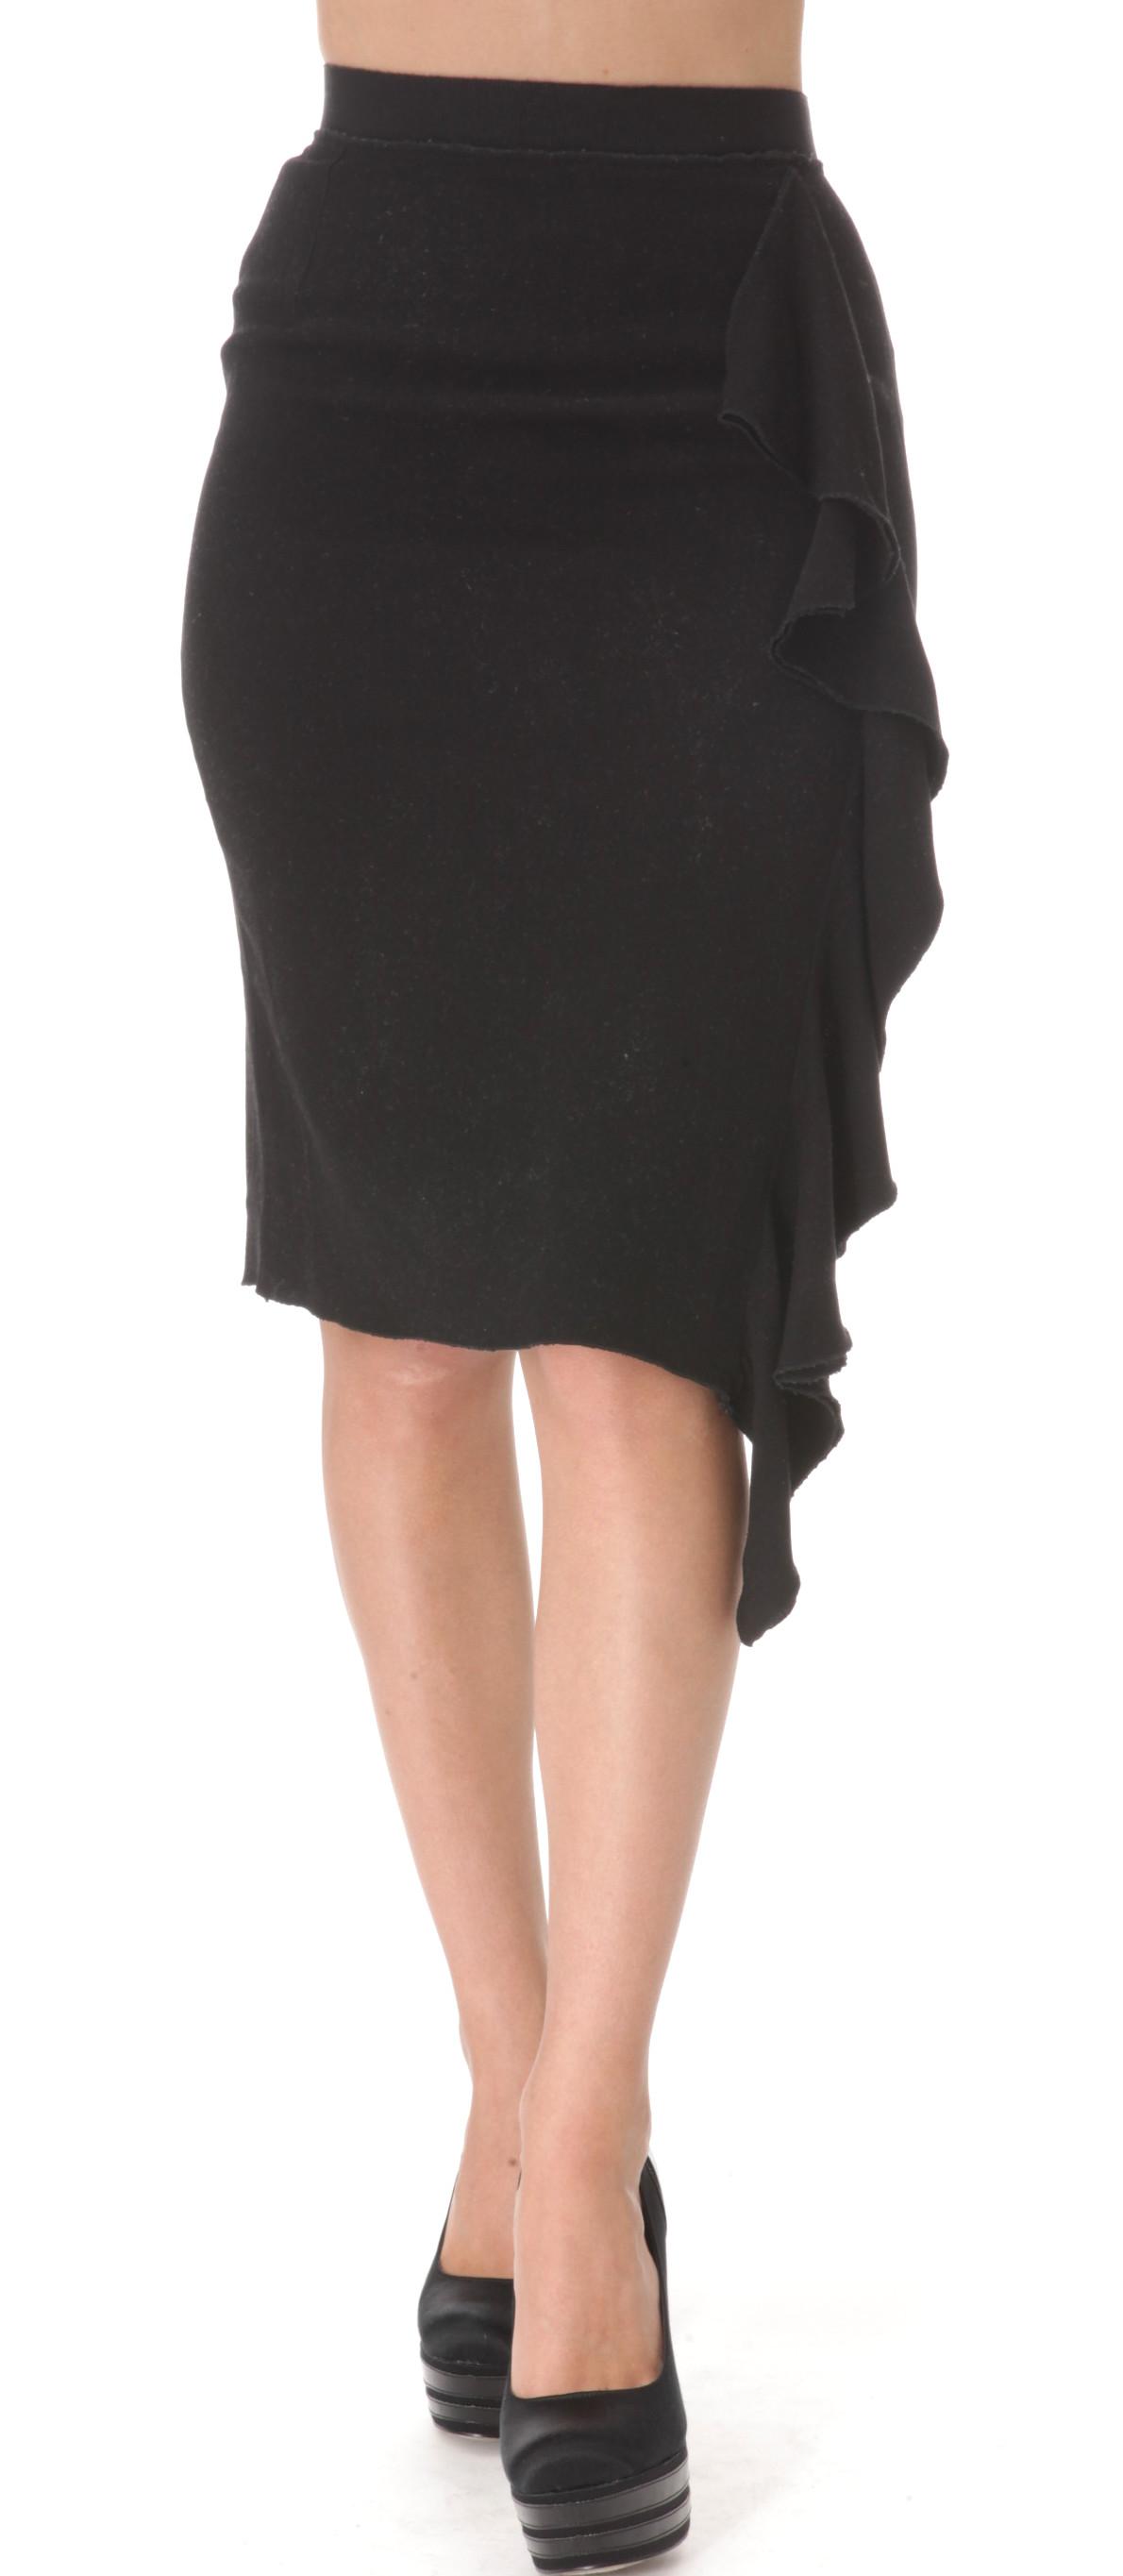 Dolce & Gabbana Women's Black Skirt at Sears.com